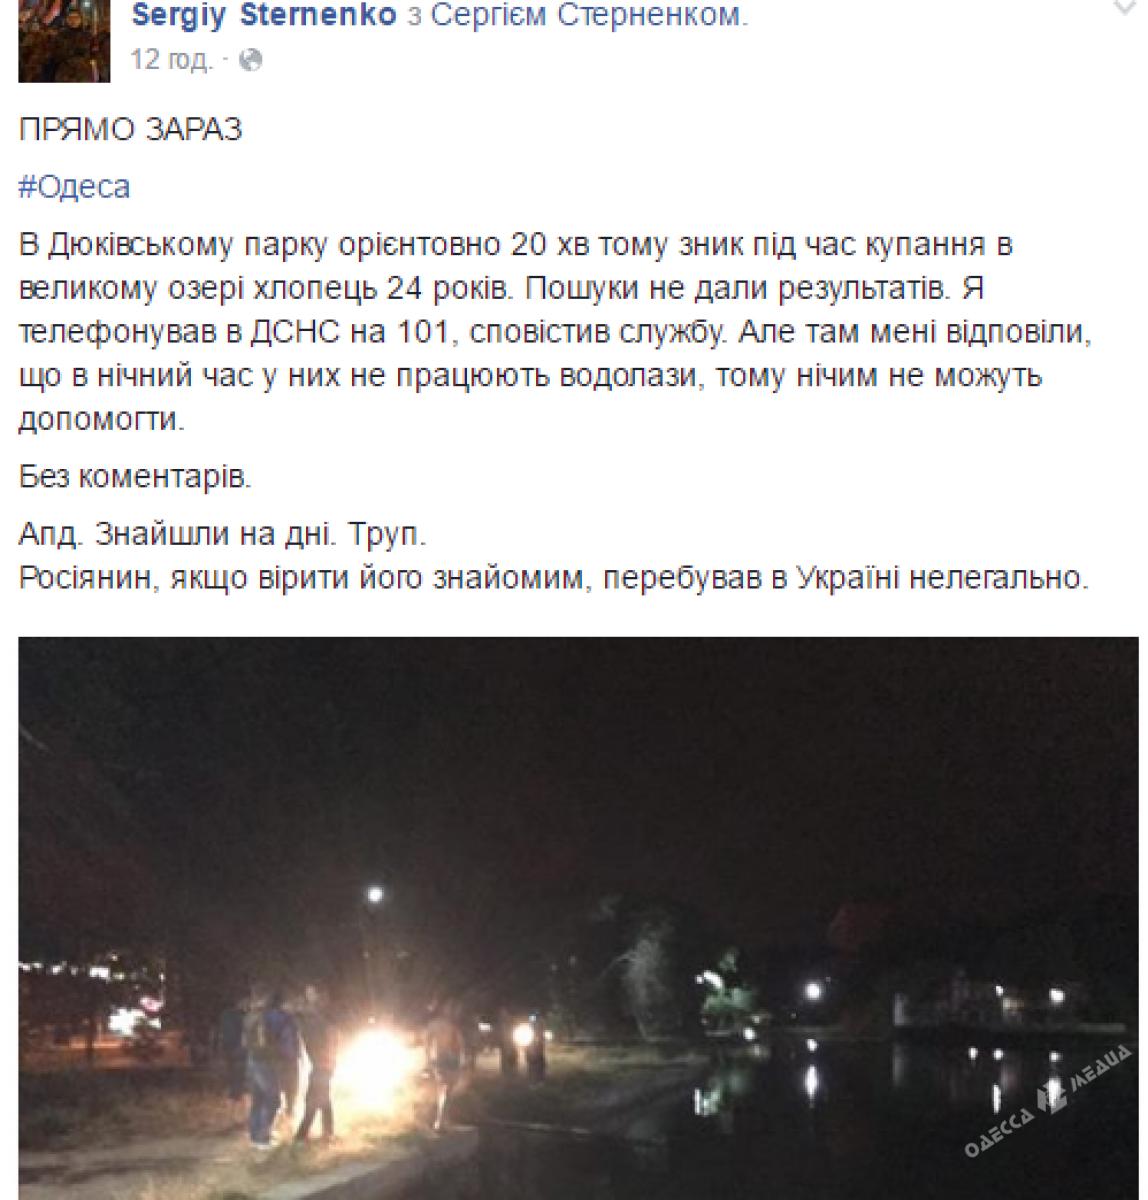 54f955252f283febff19757b6333560a В Одессе нашли труп